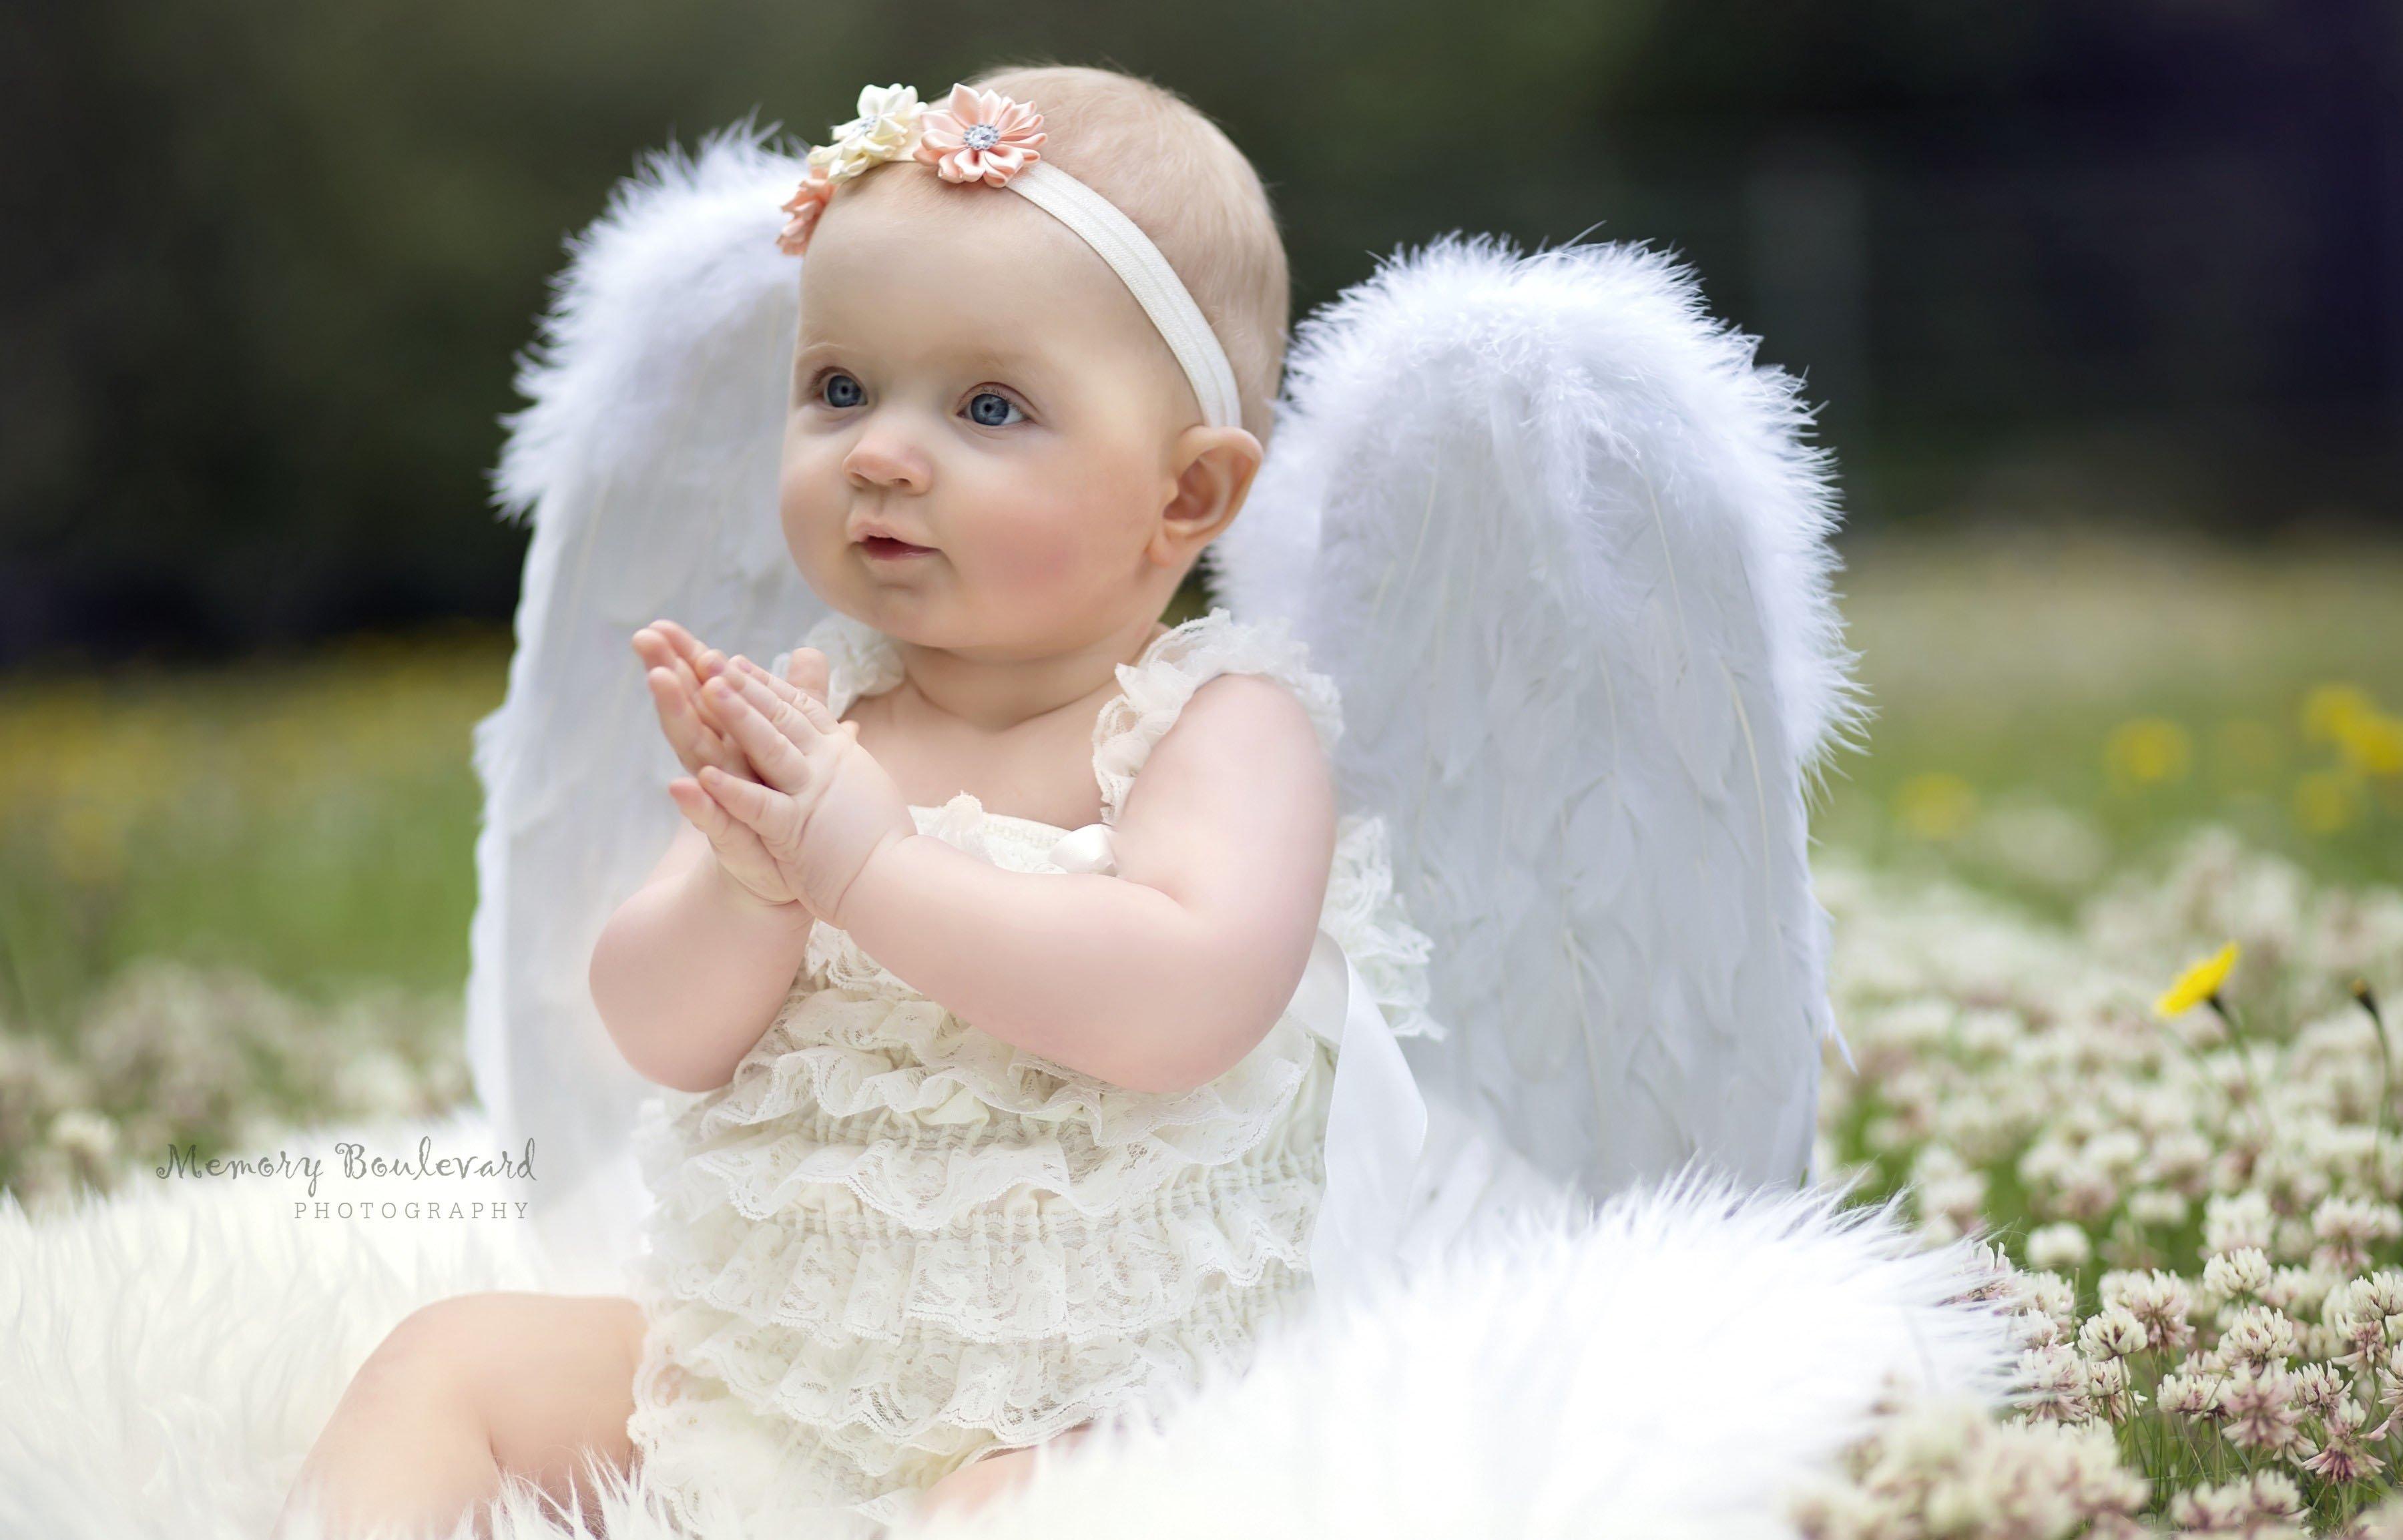 children beauty beautiful angel cute girl baby wallpaper | 3600x2307